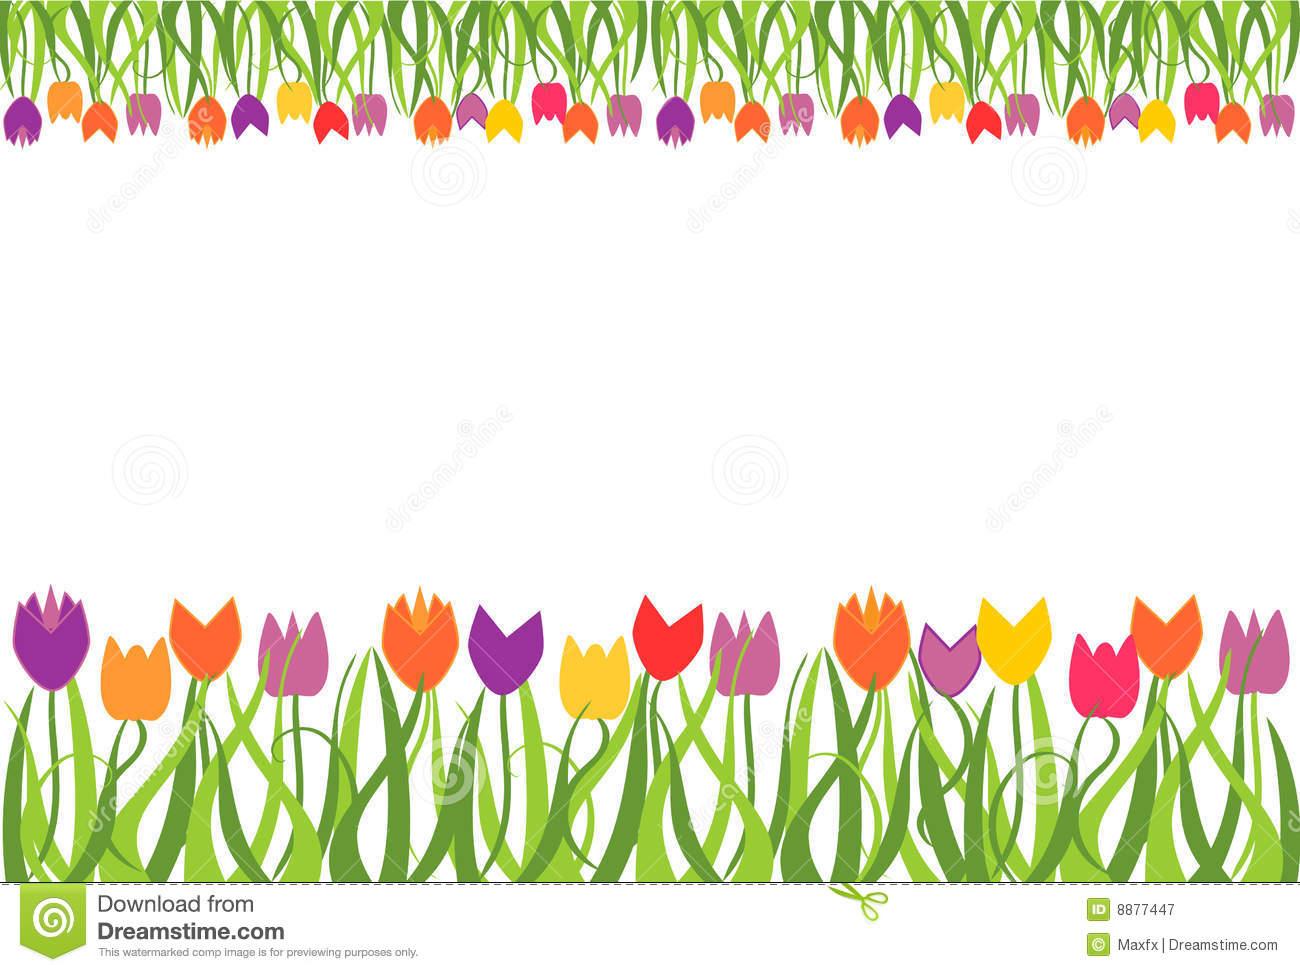 Tulip clipart border #7